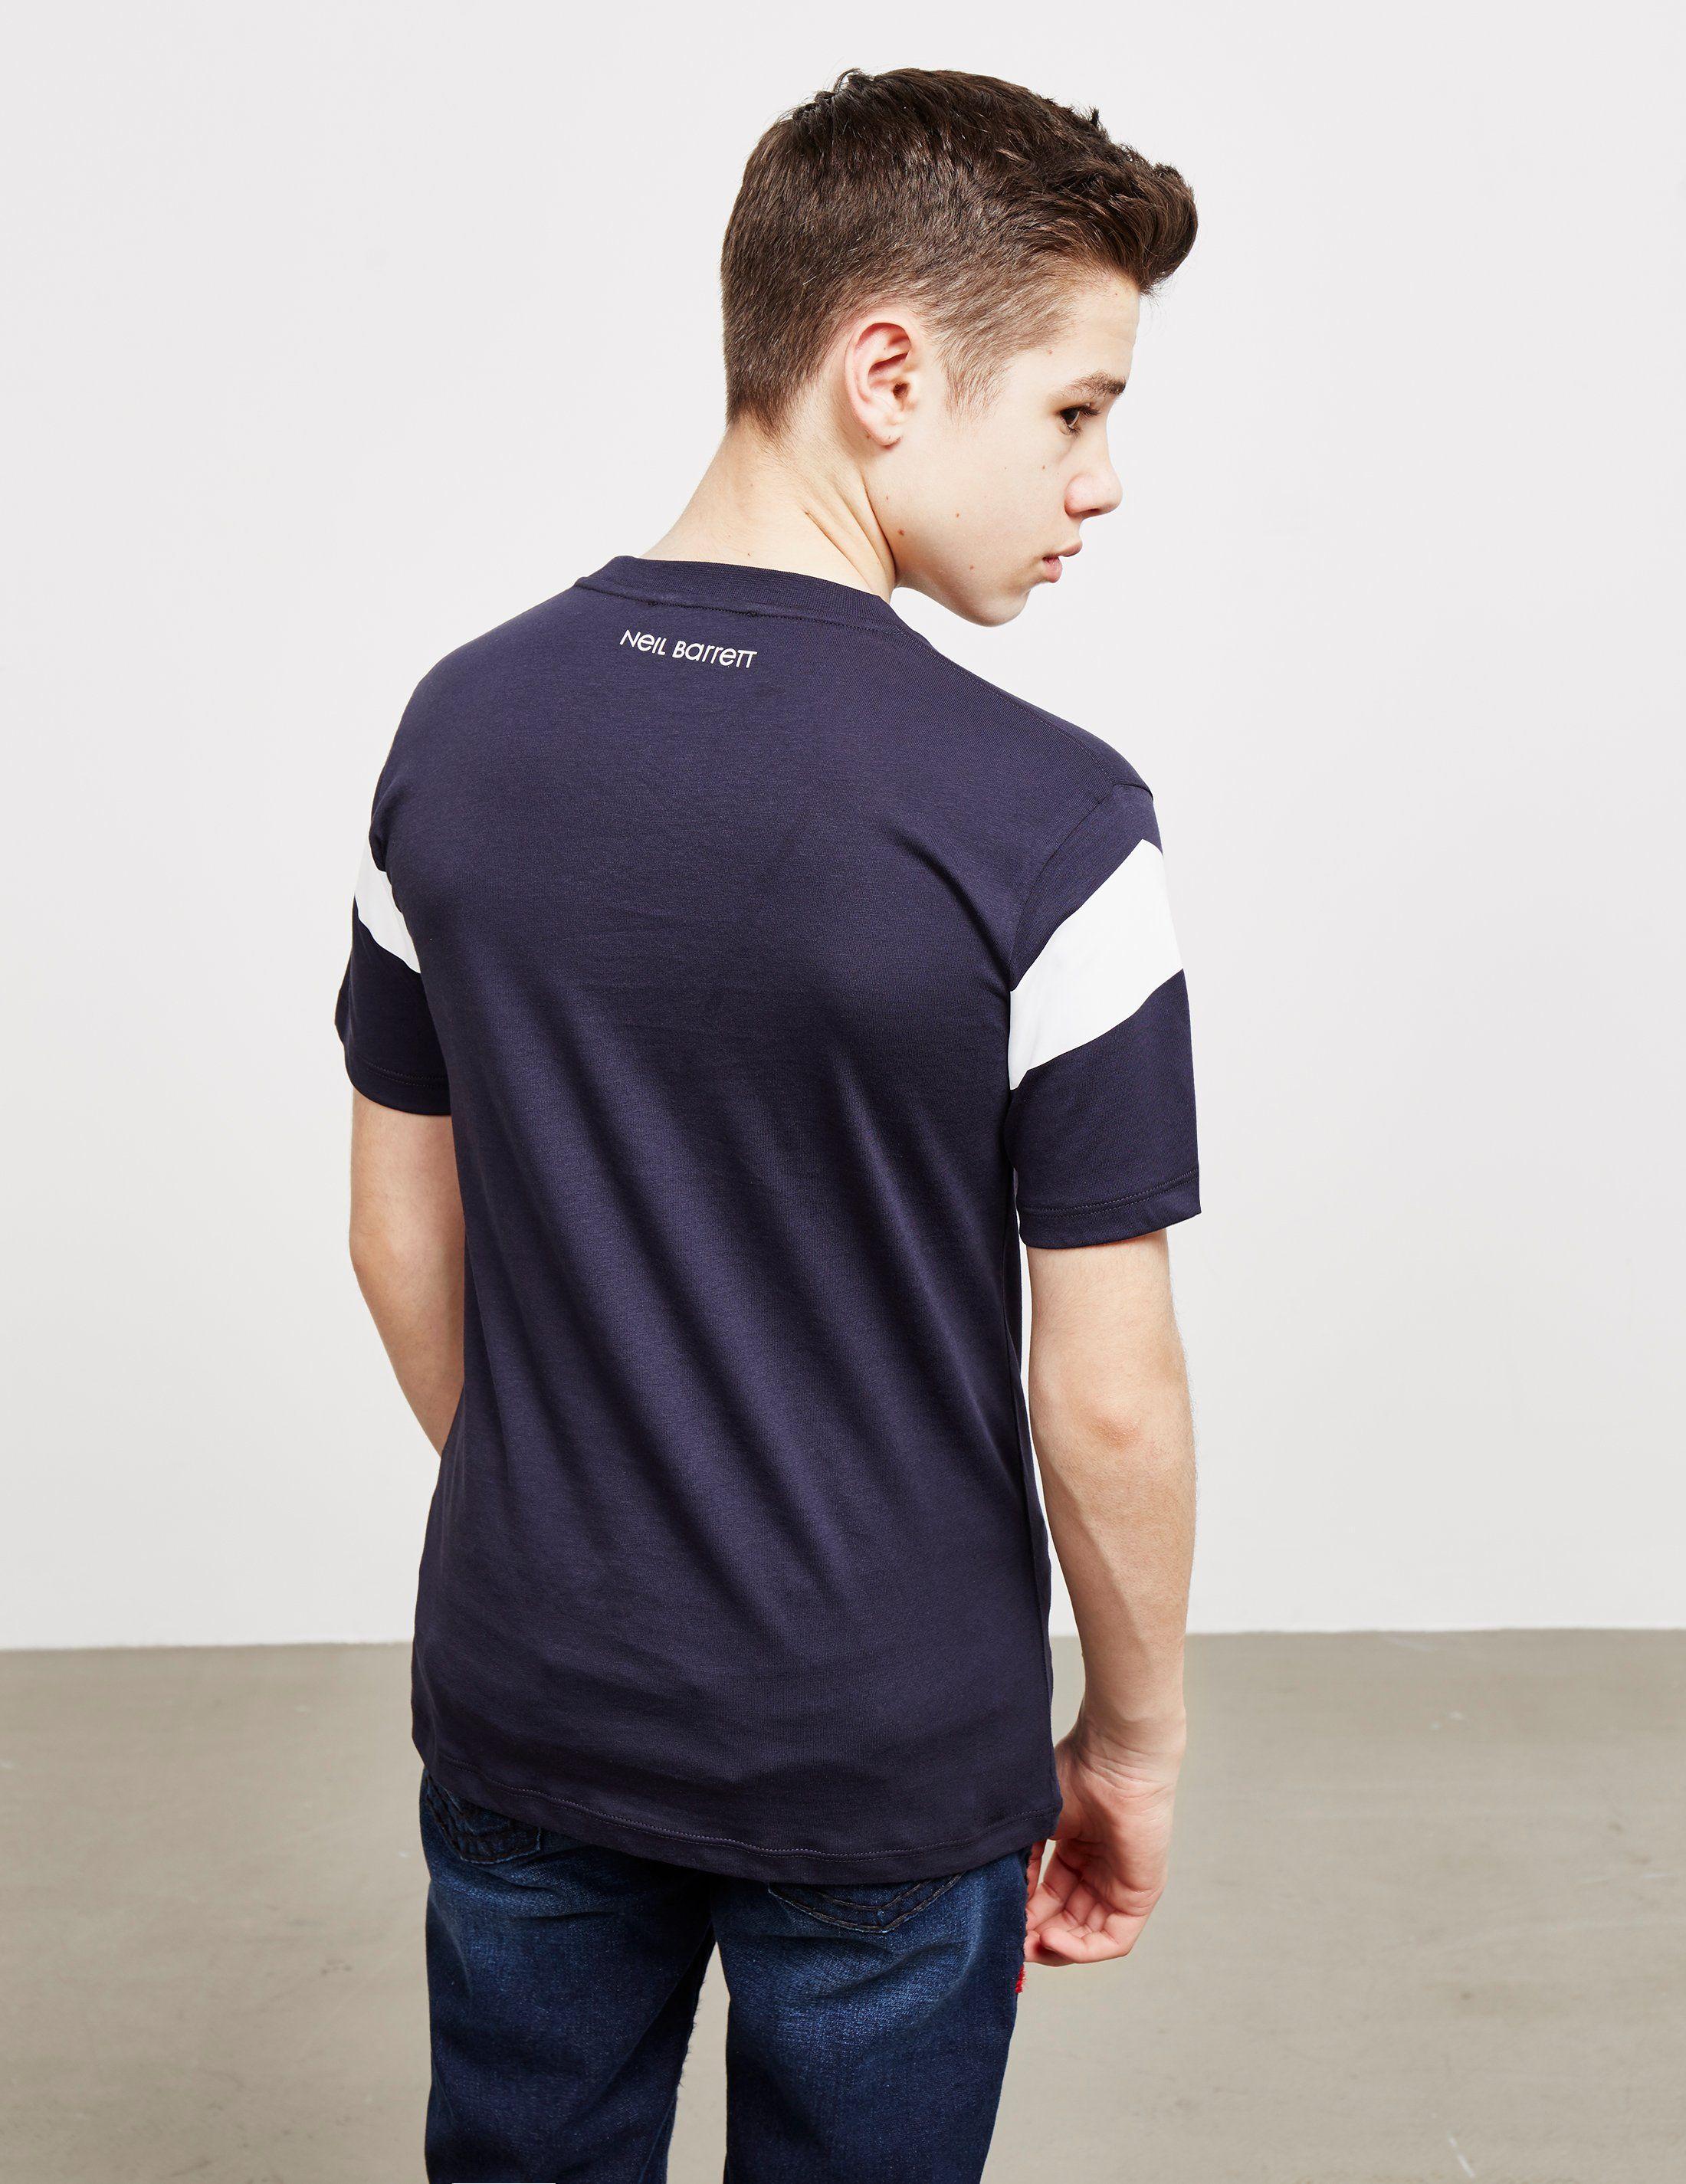 Neil Barrett Mirror Bolt Short Sleeve T-Shirt